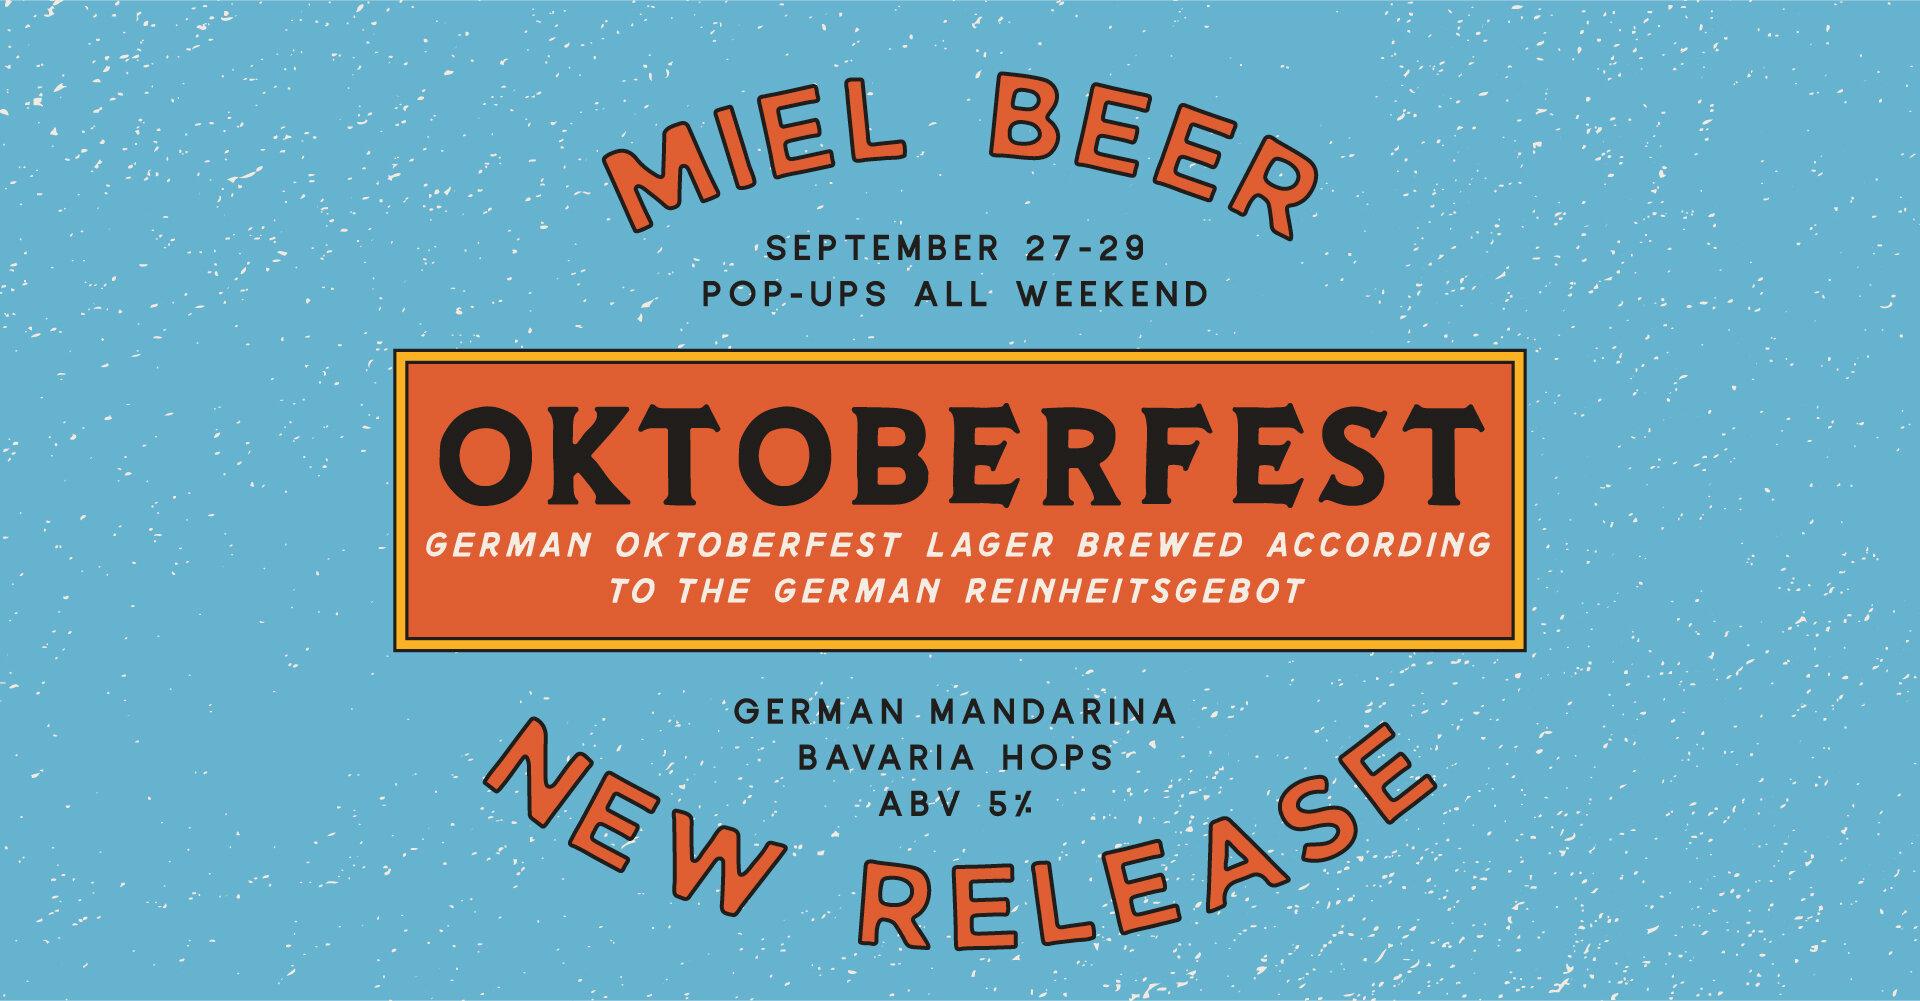 Miel Brewery_New Orleans_Beer Release_Oktoberfest_Lager